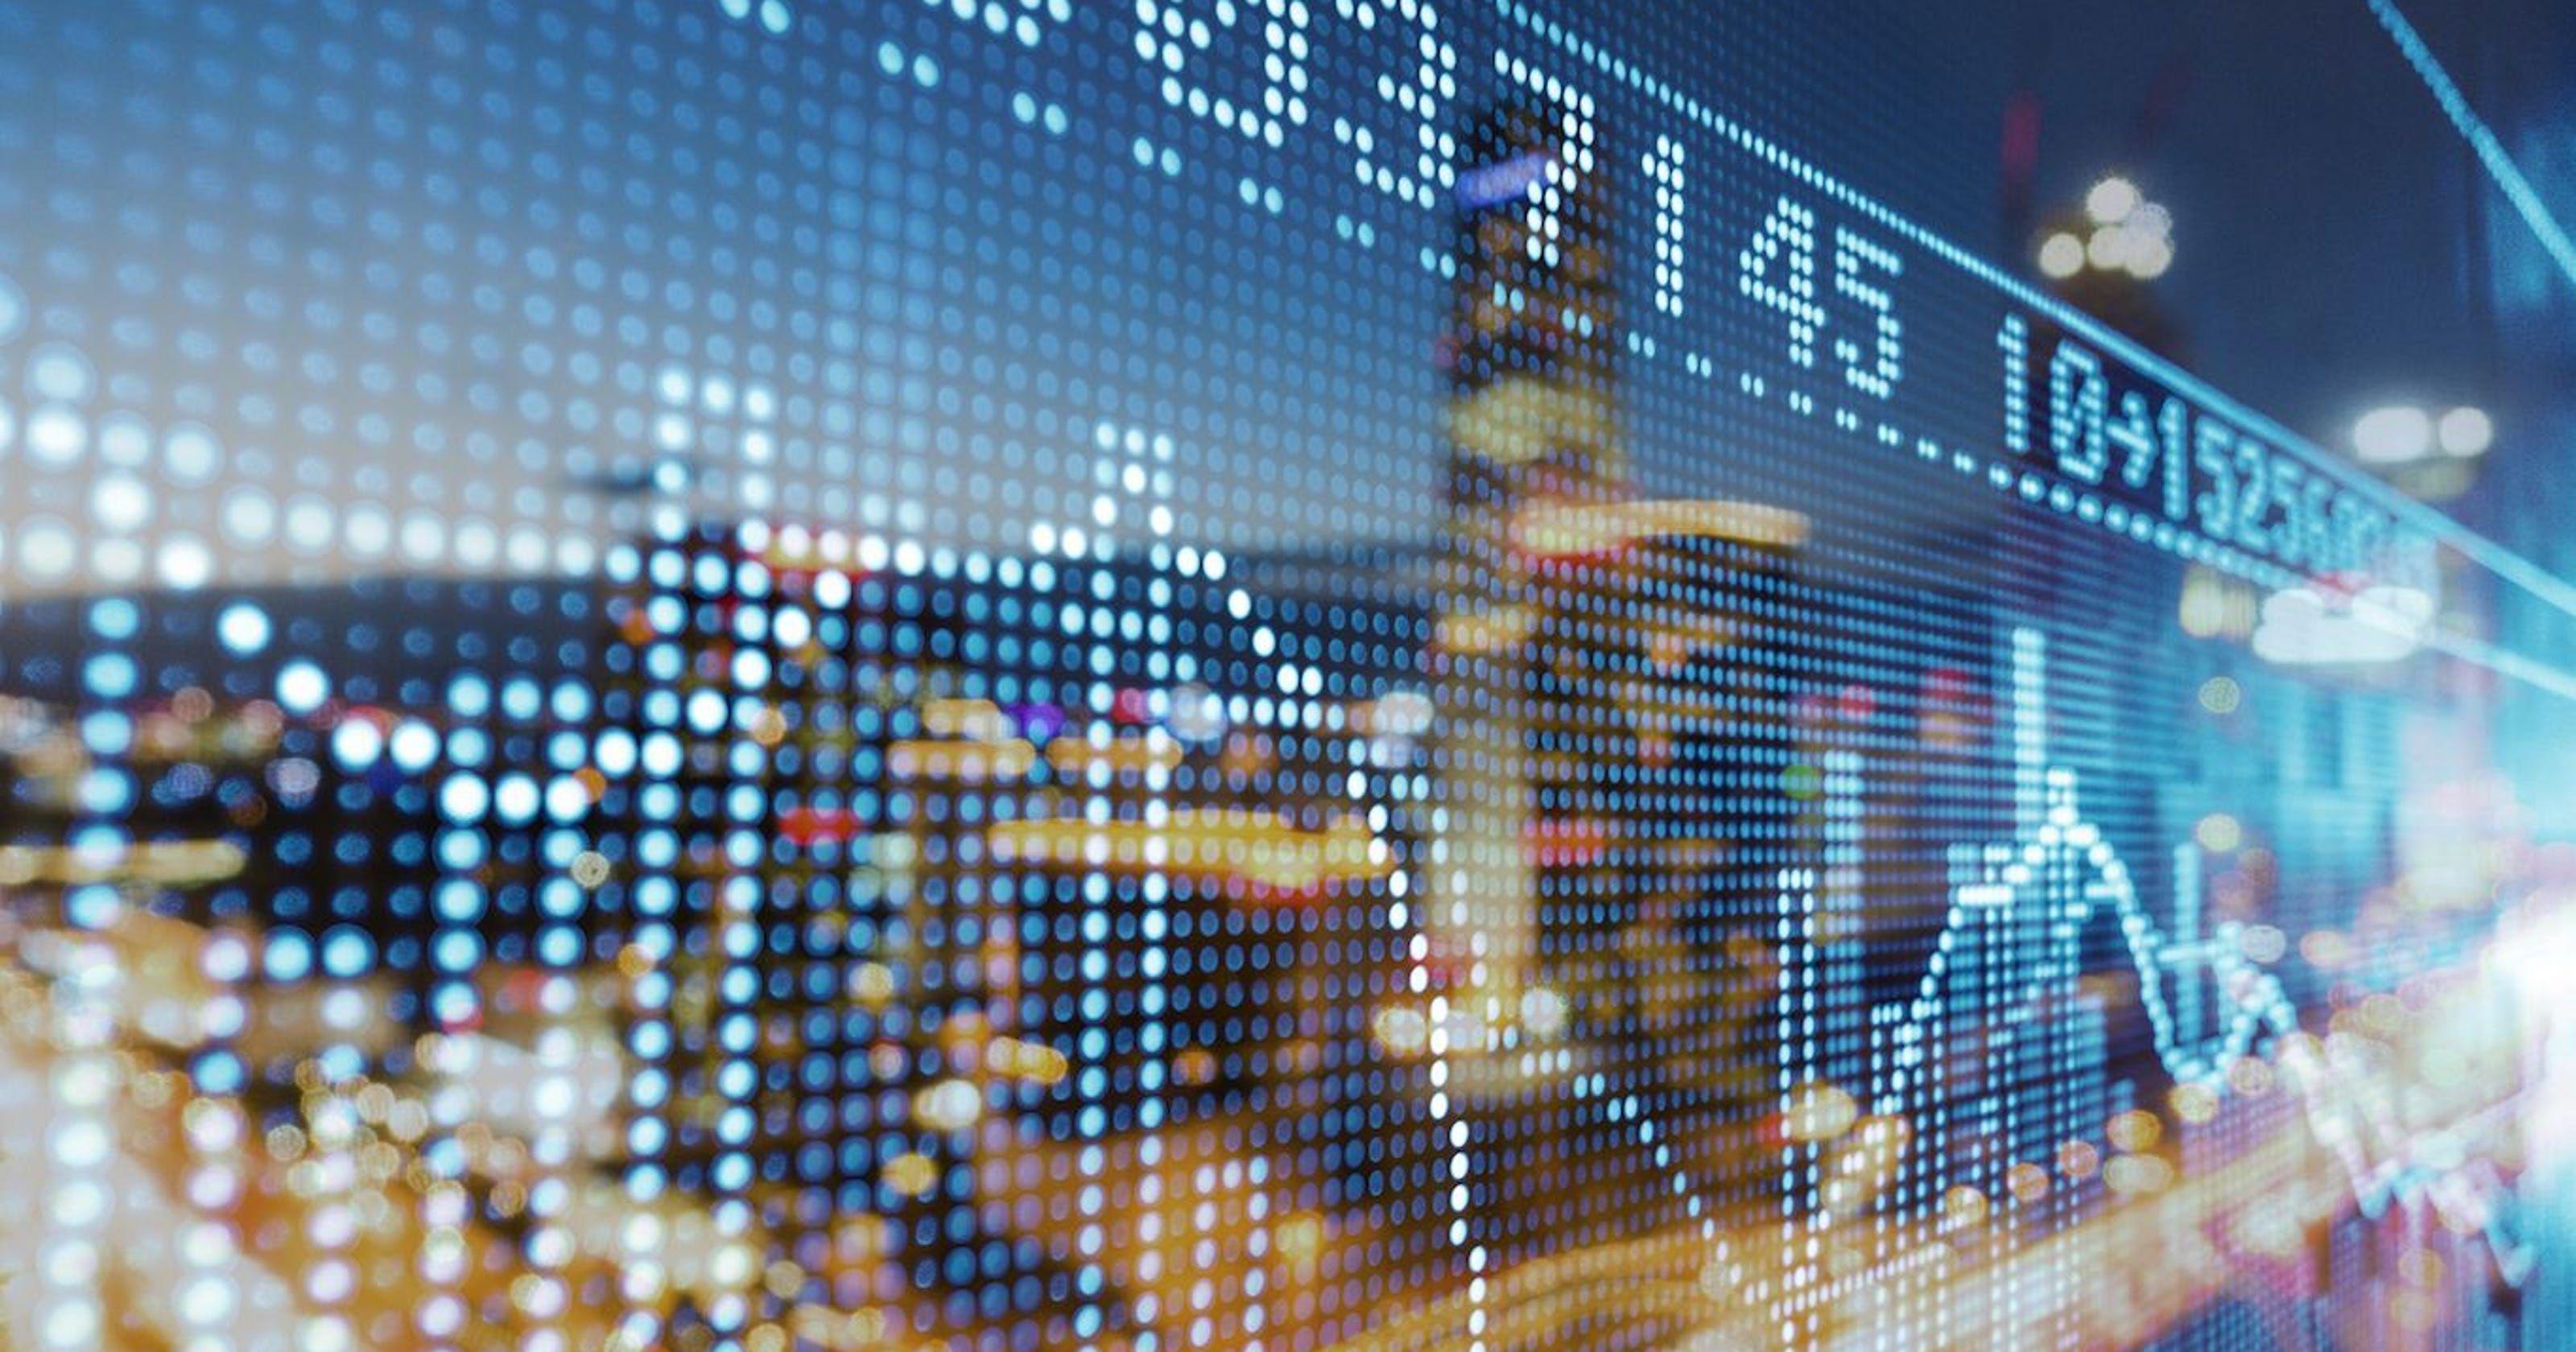 Stock Market Wallpapers - Top Free Stock Market ...